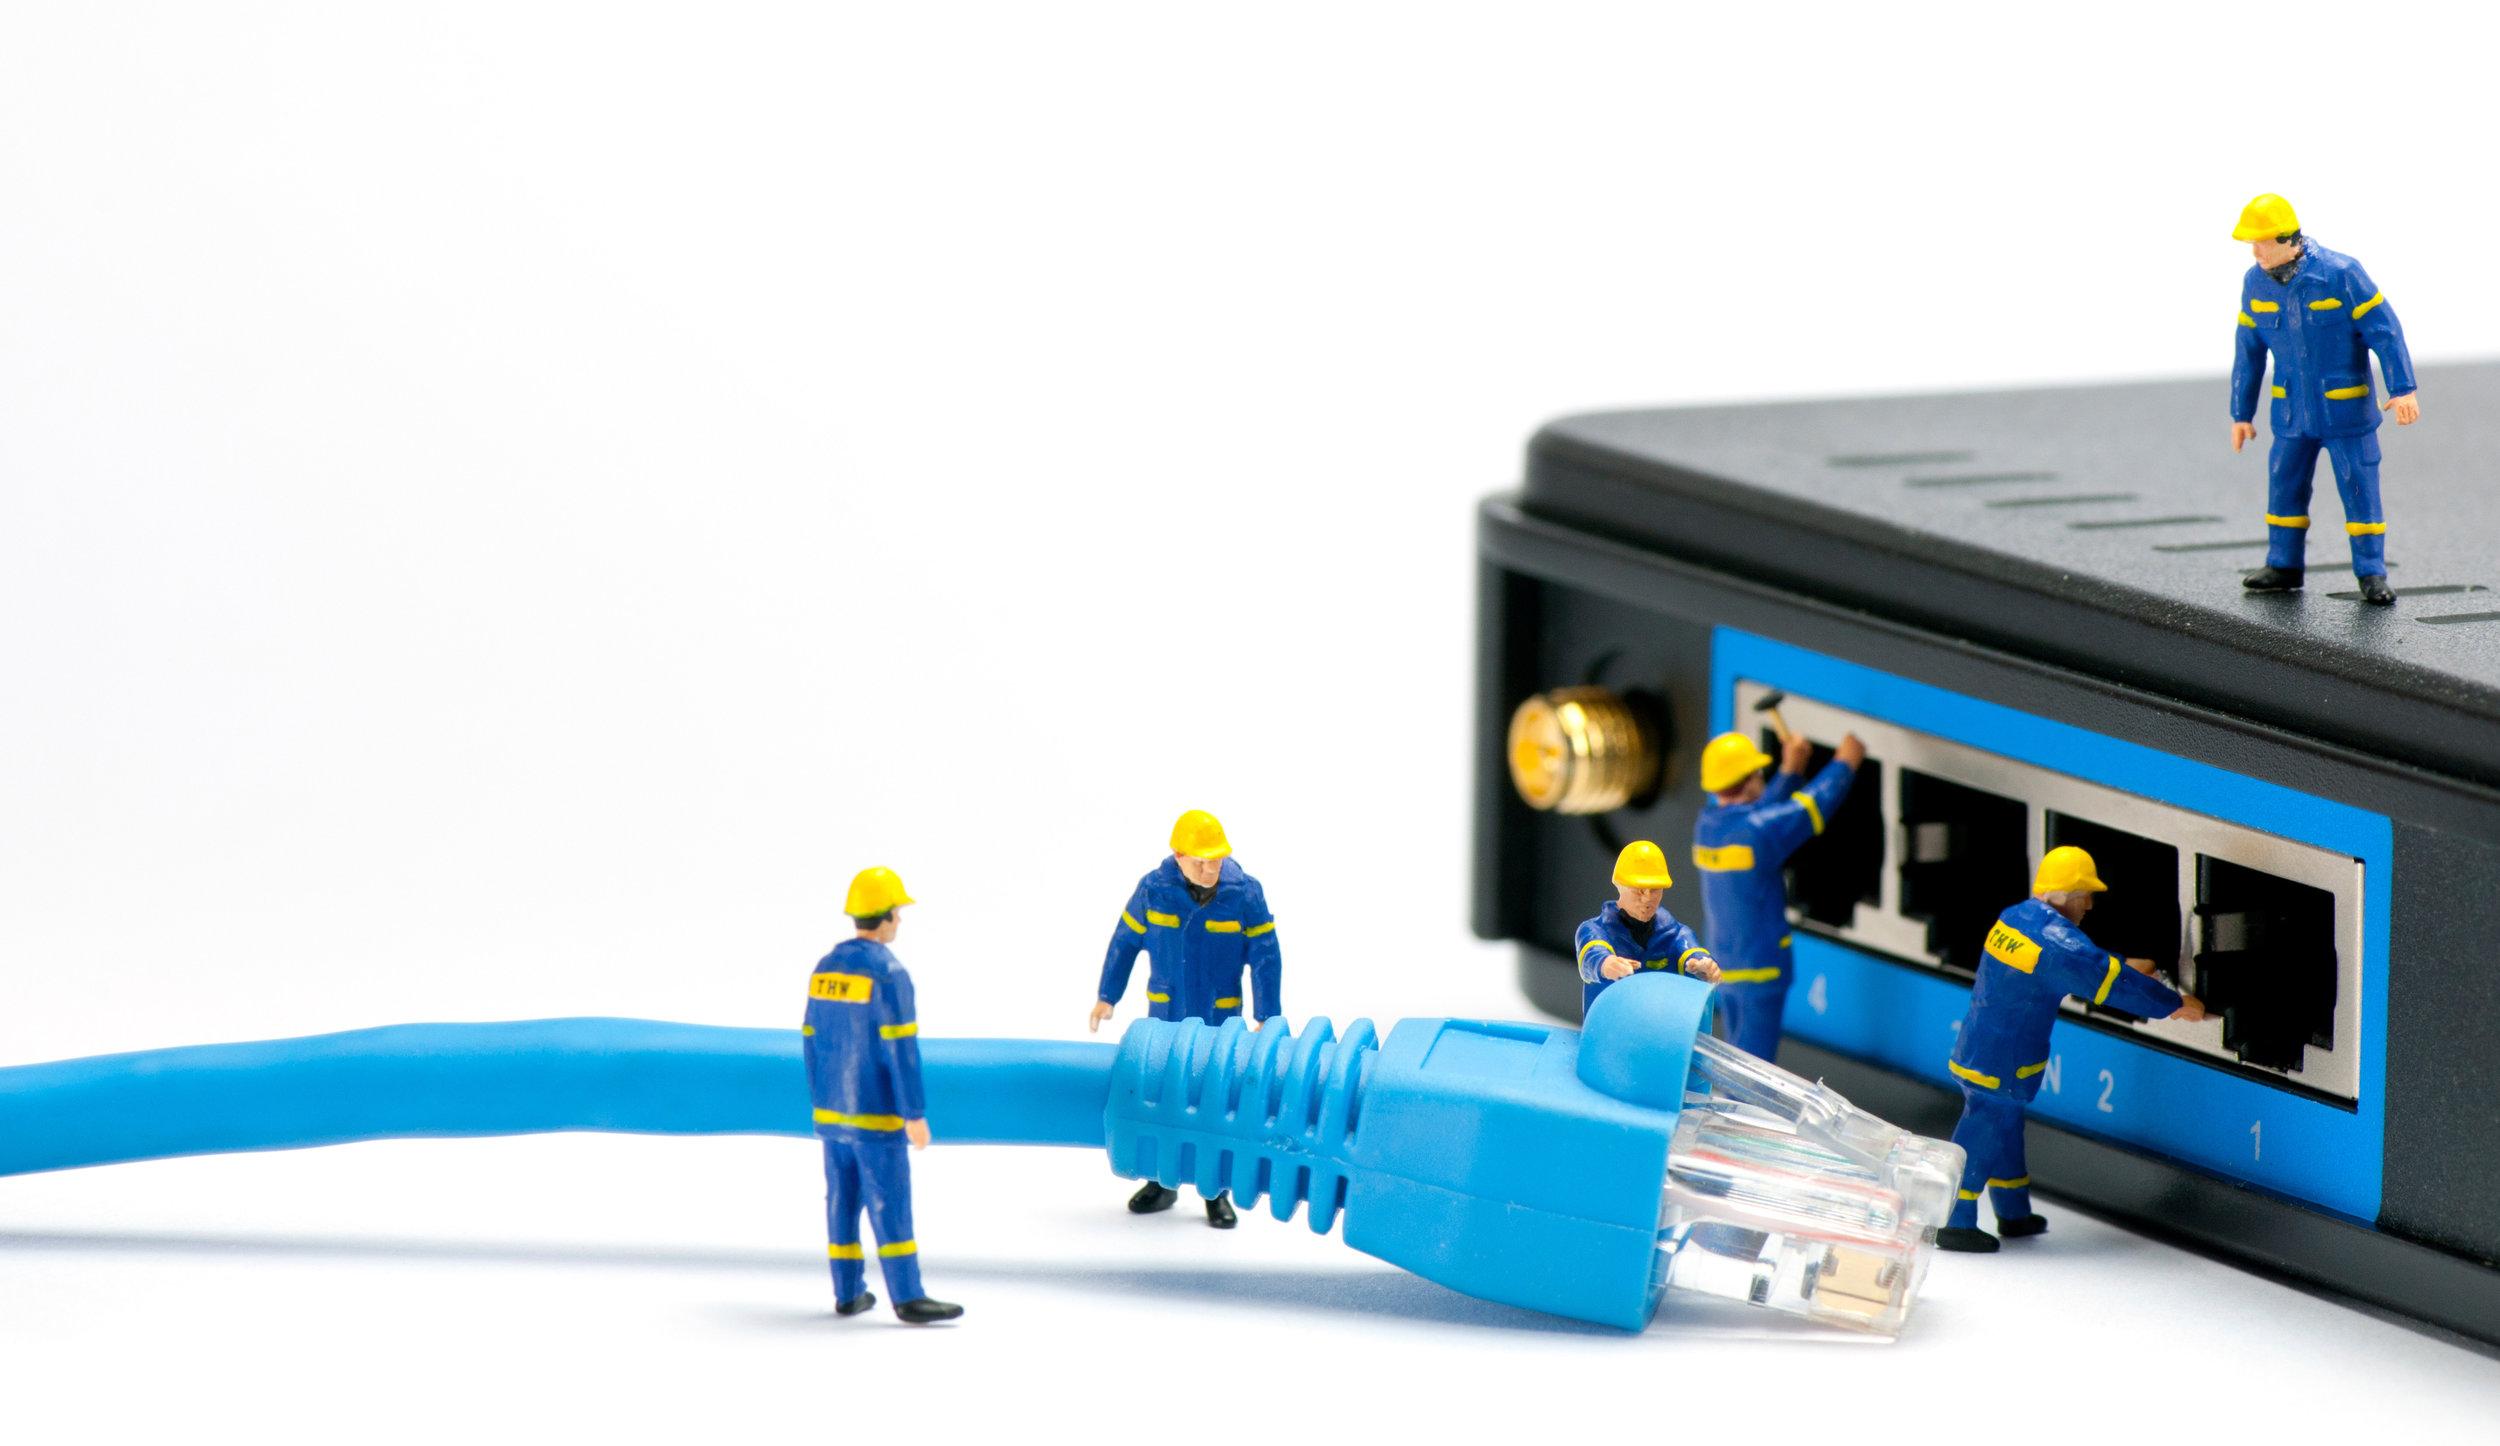 technicians-connecting-network-cable_zkAdn9A_.jpg